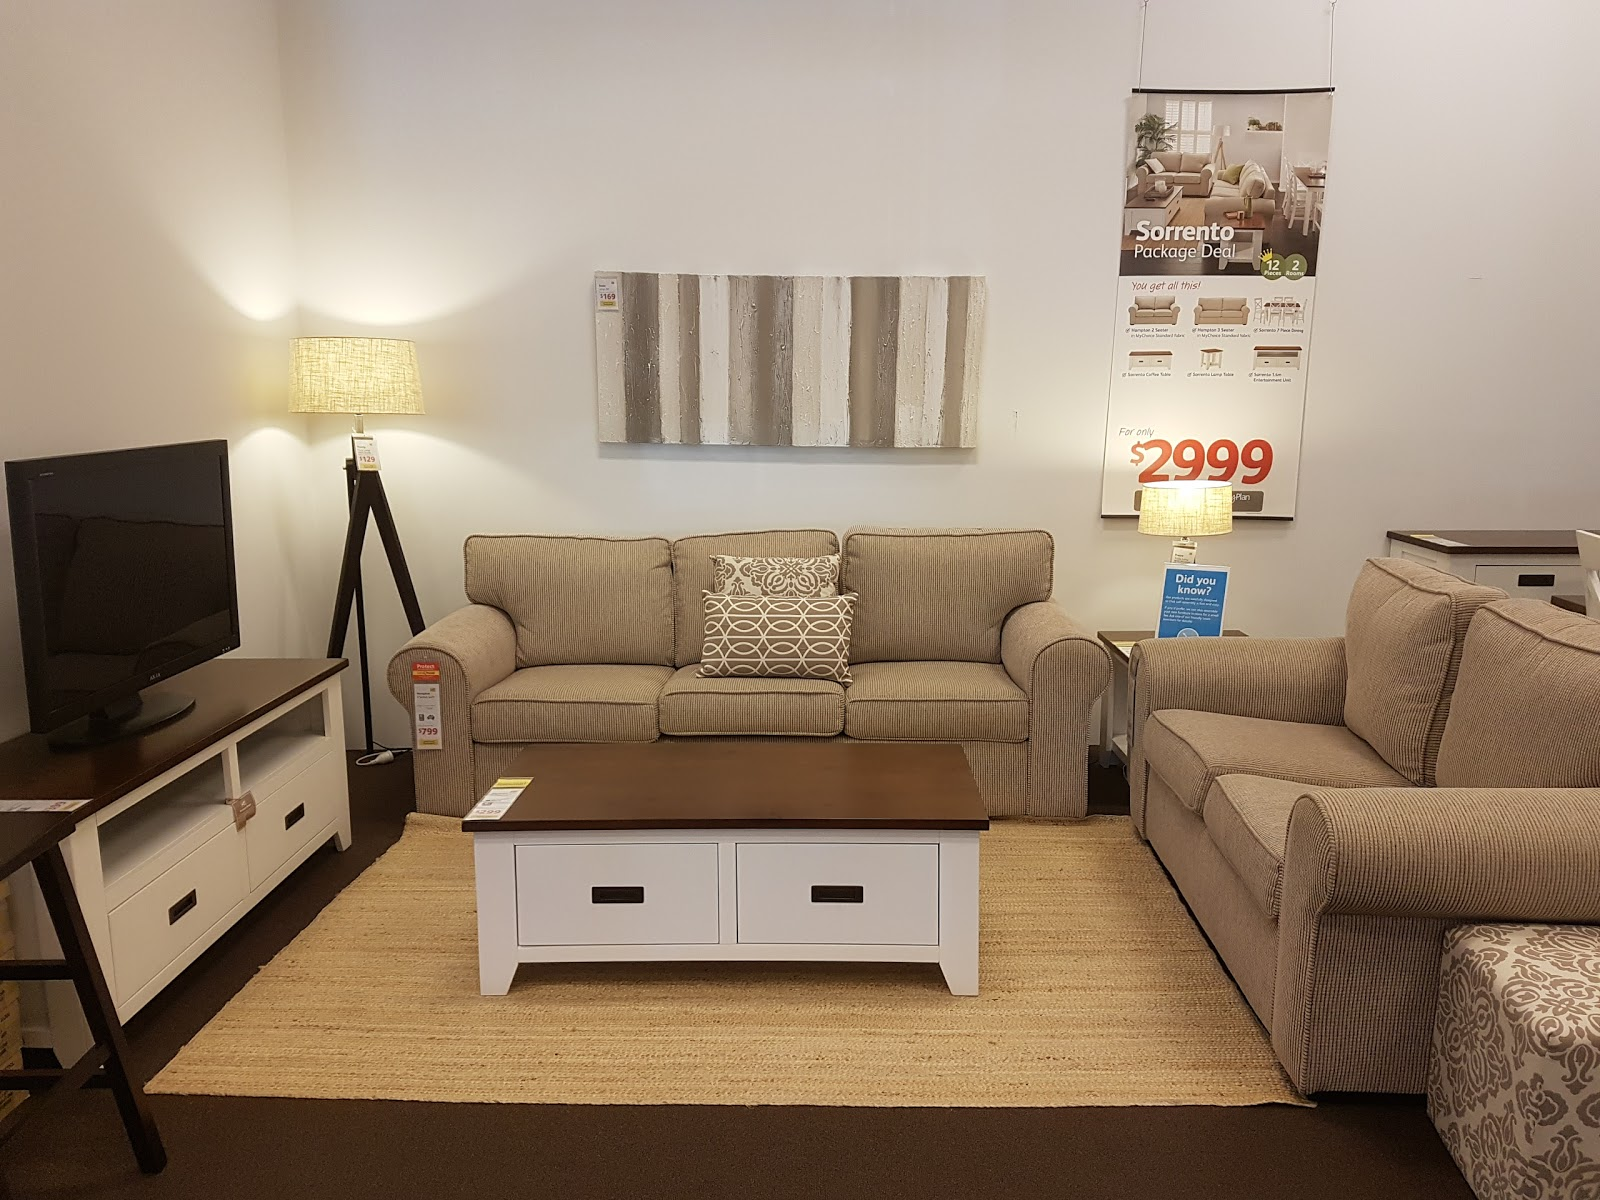 FANTASTIC FURNITURE PENRITH NSW Merchant details. Fantastic Furniture Penrith   cpgworkflow com